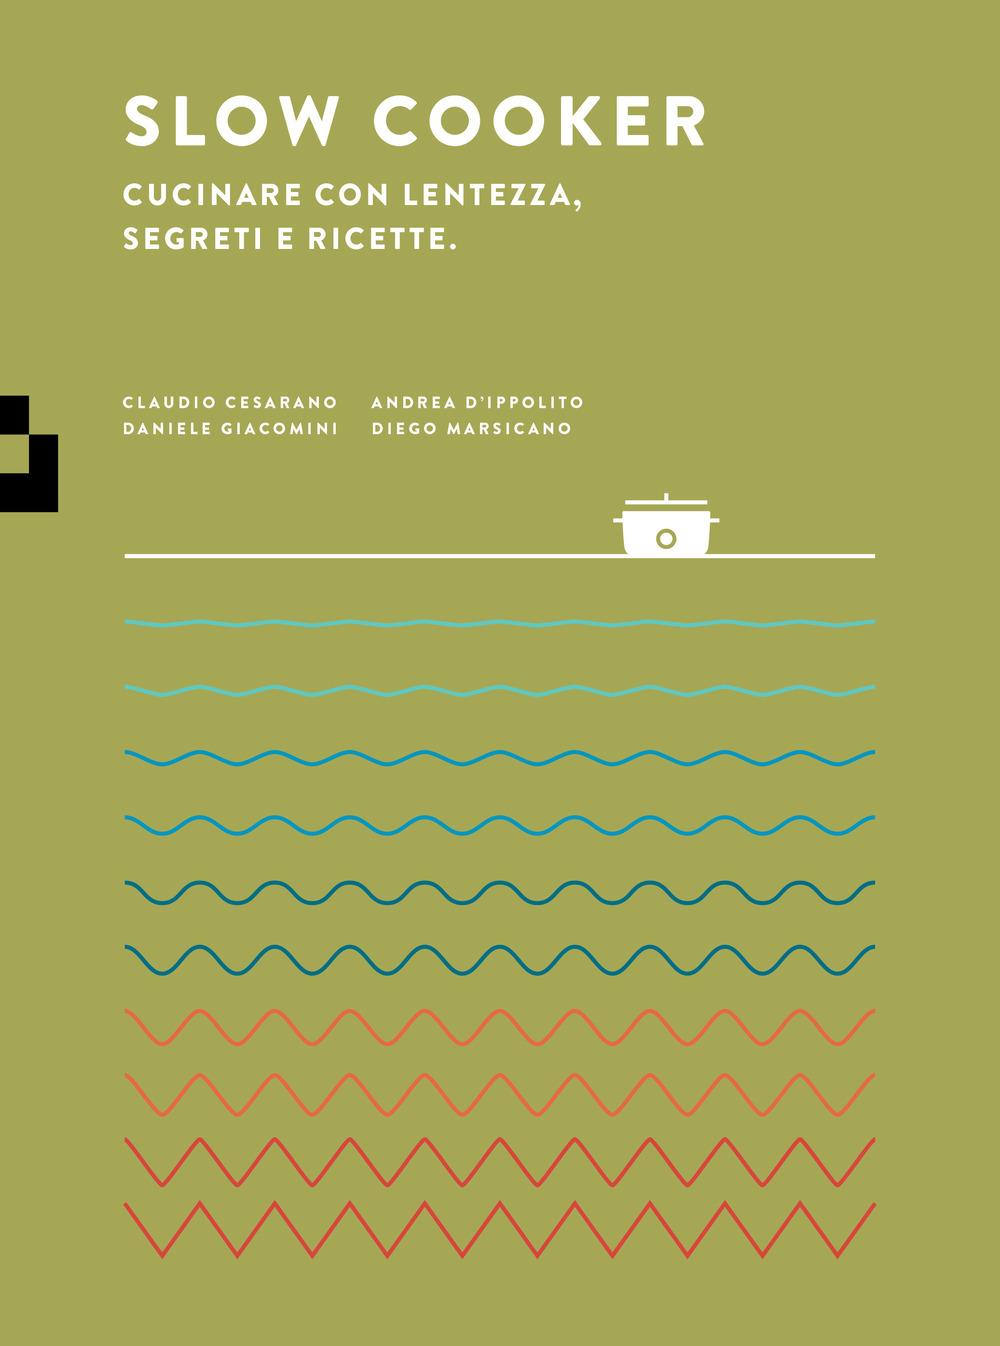 SLOW COOKER - C.CESARANO - A.D'IPPOLITO - D.GIACOMINI - DIEGO MARSICANO - 9788885546080